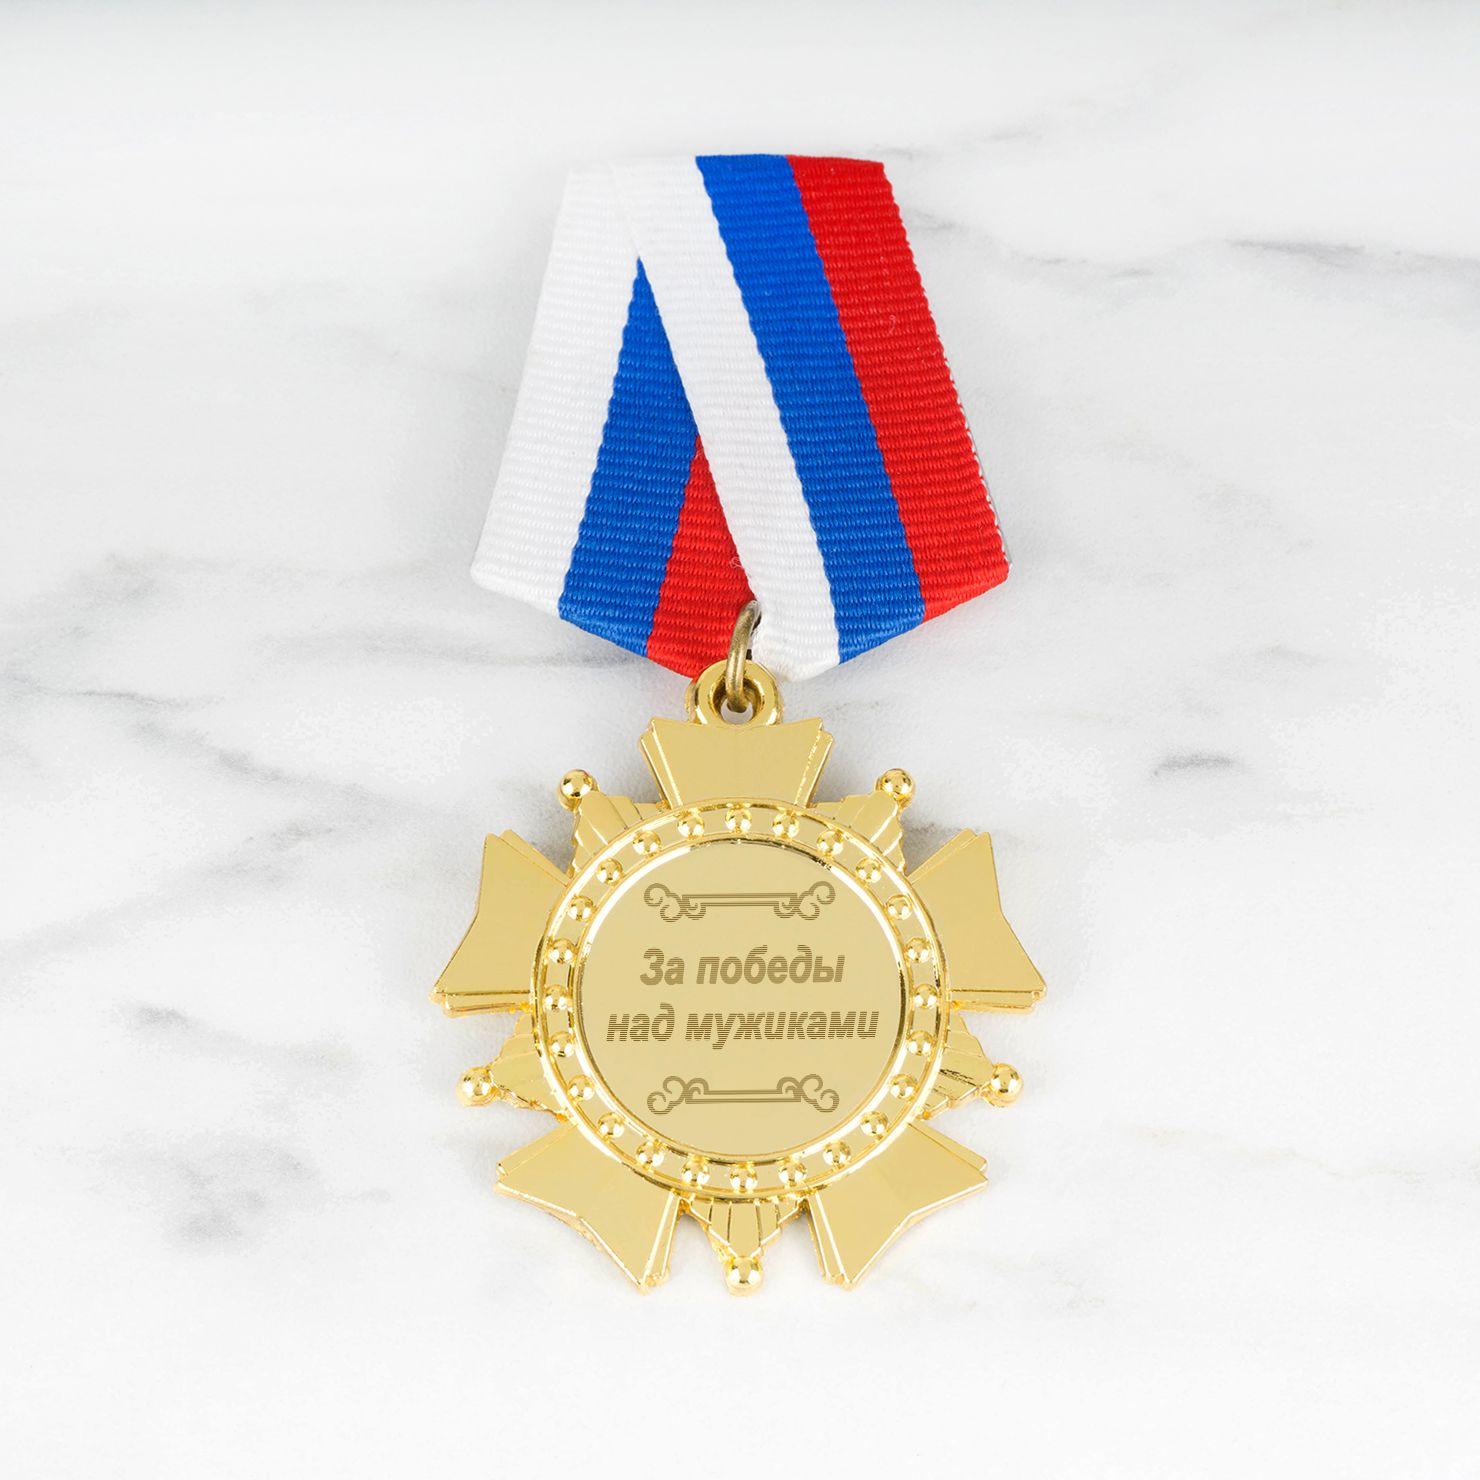 Орден *За победы над мужиками*